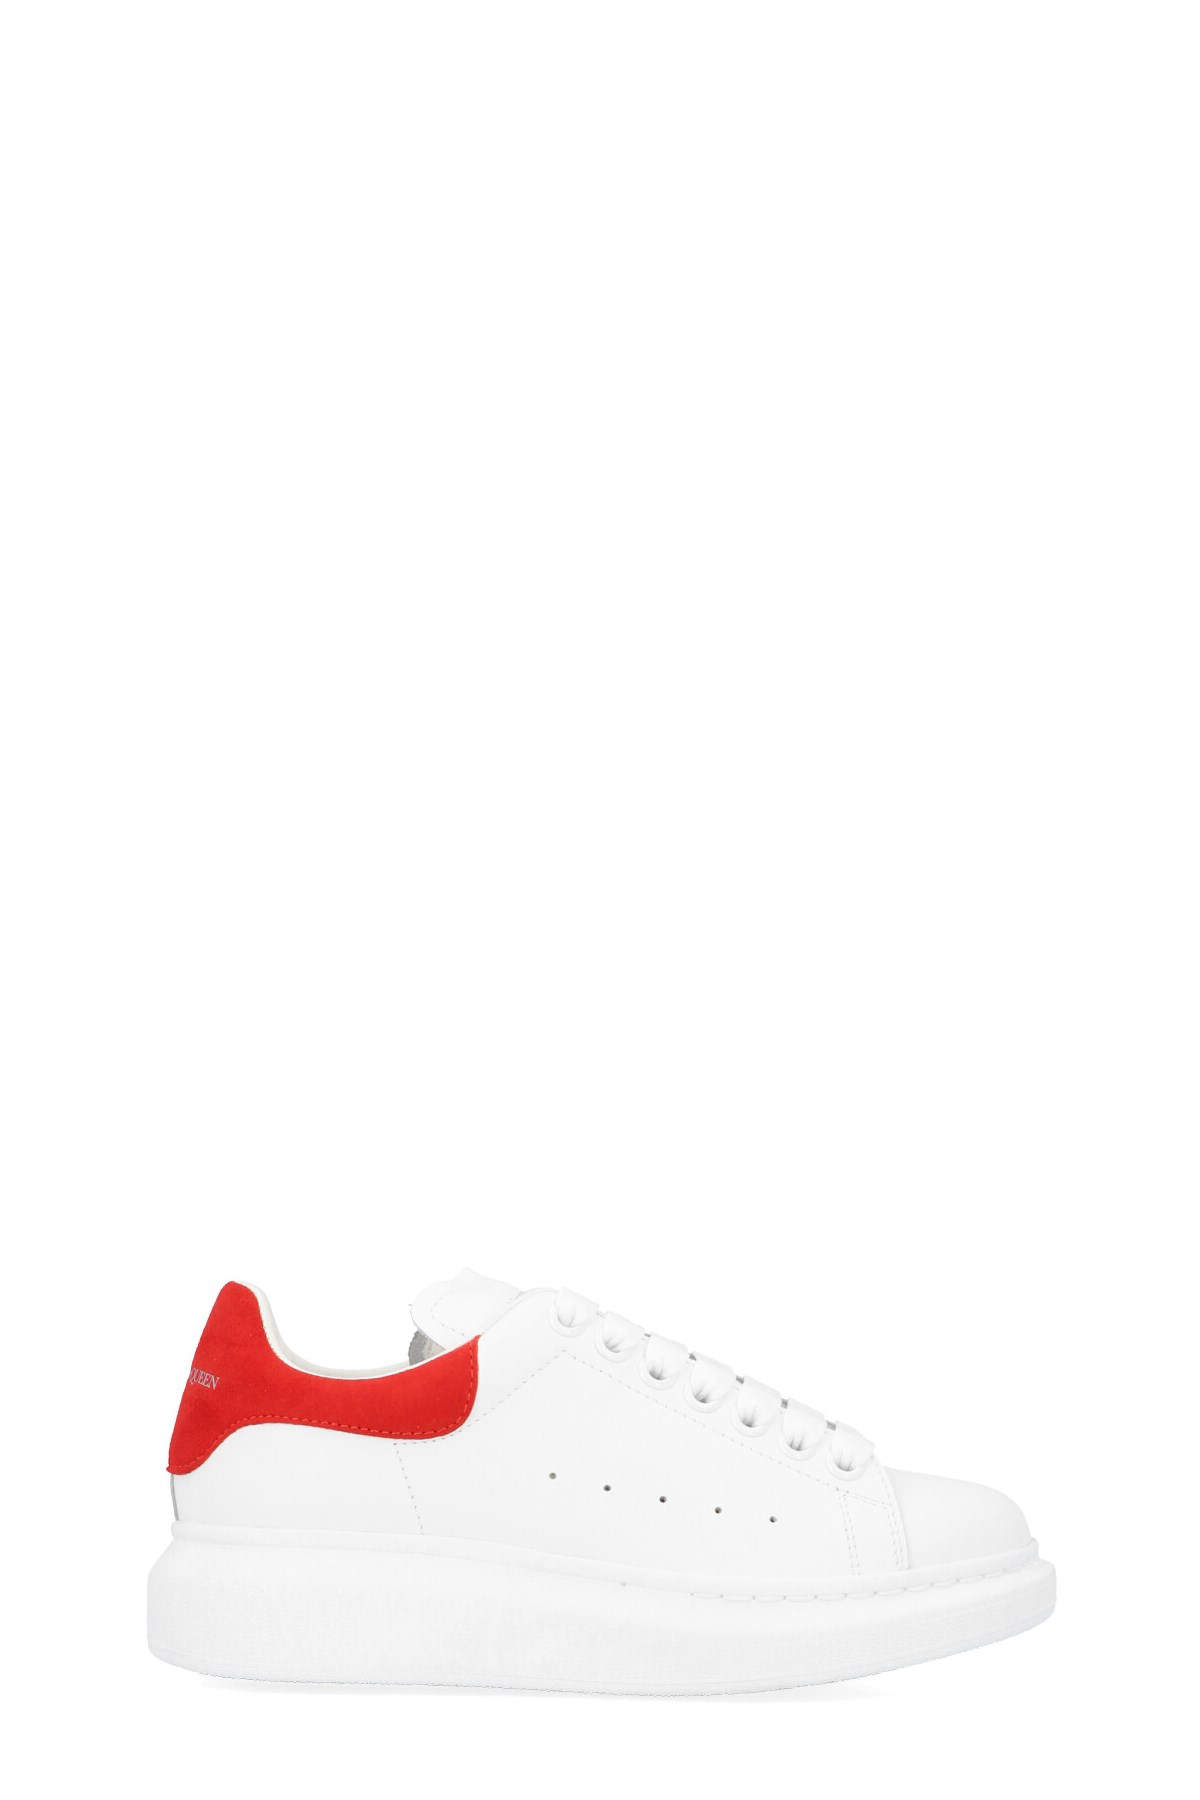 'Big sole' sneakers